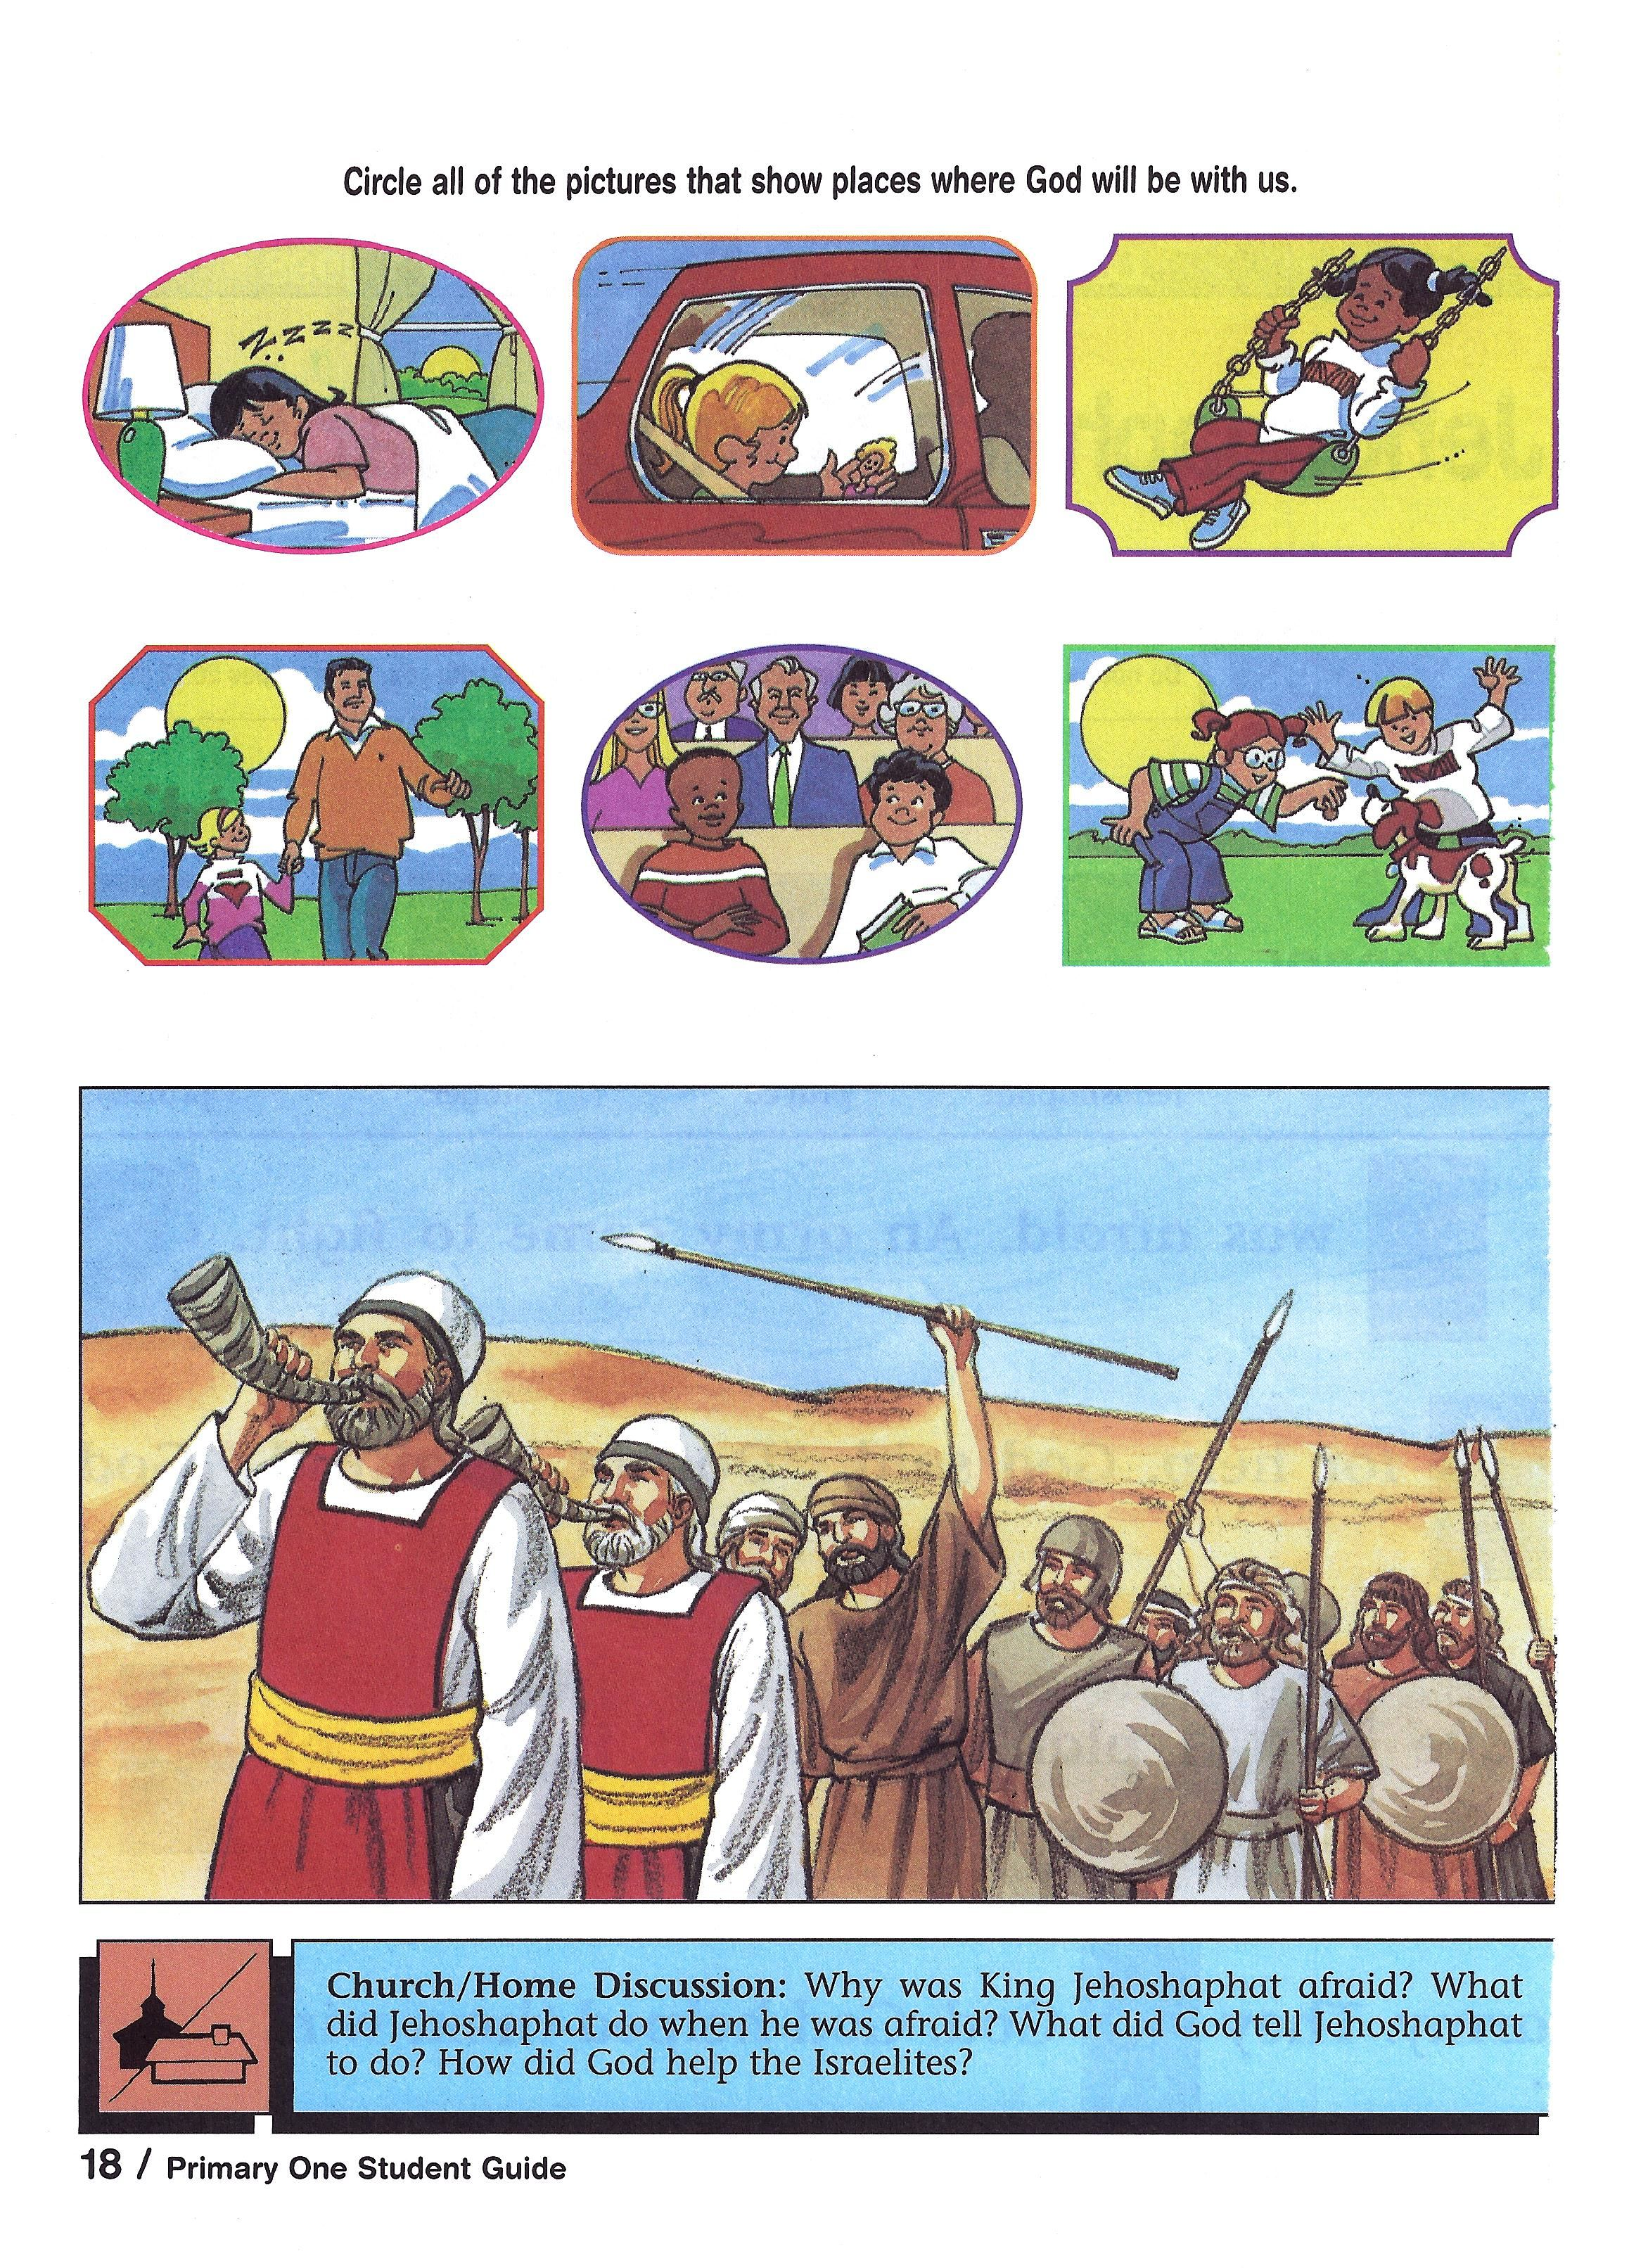 Jehoshaphat